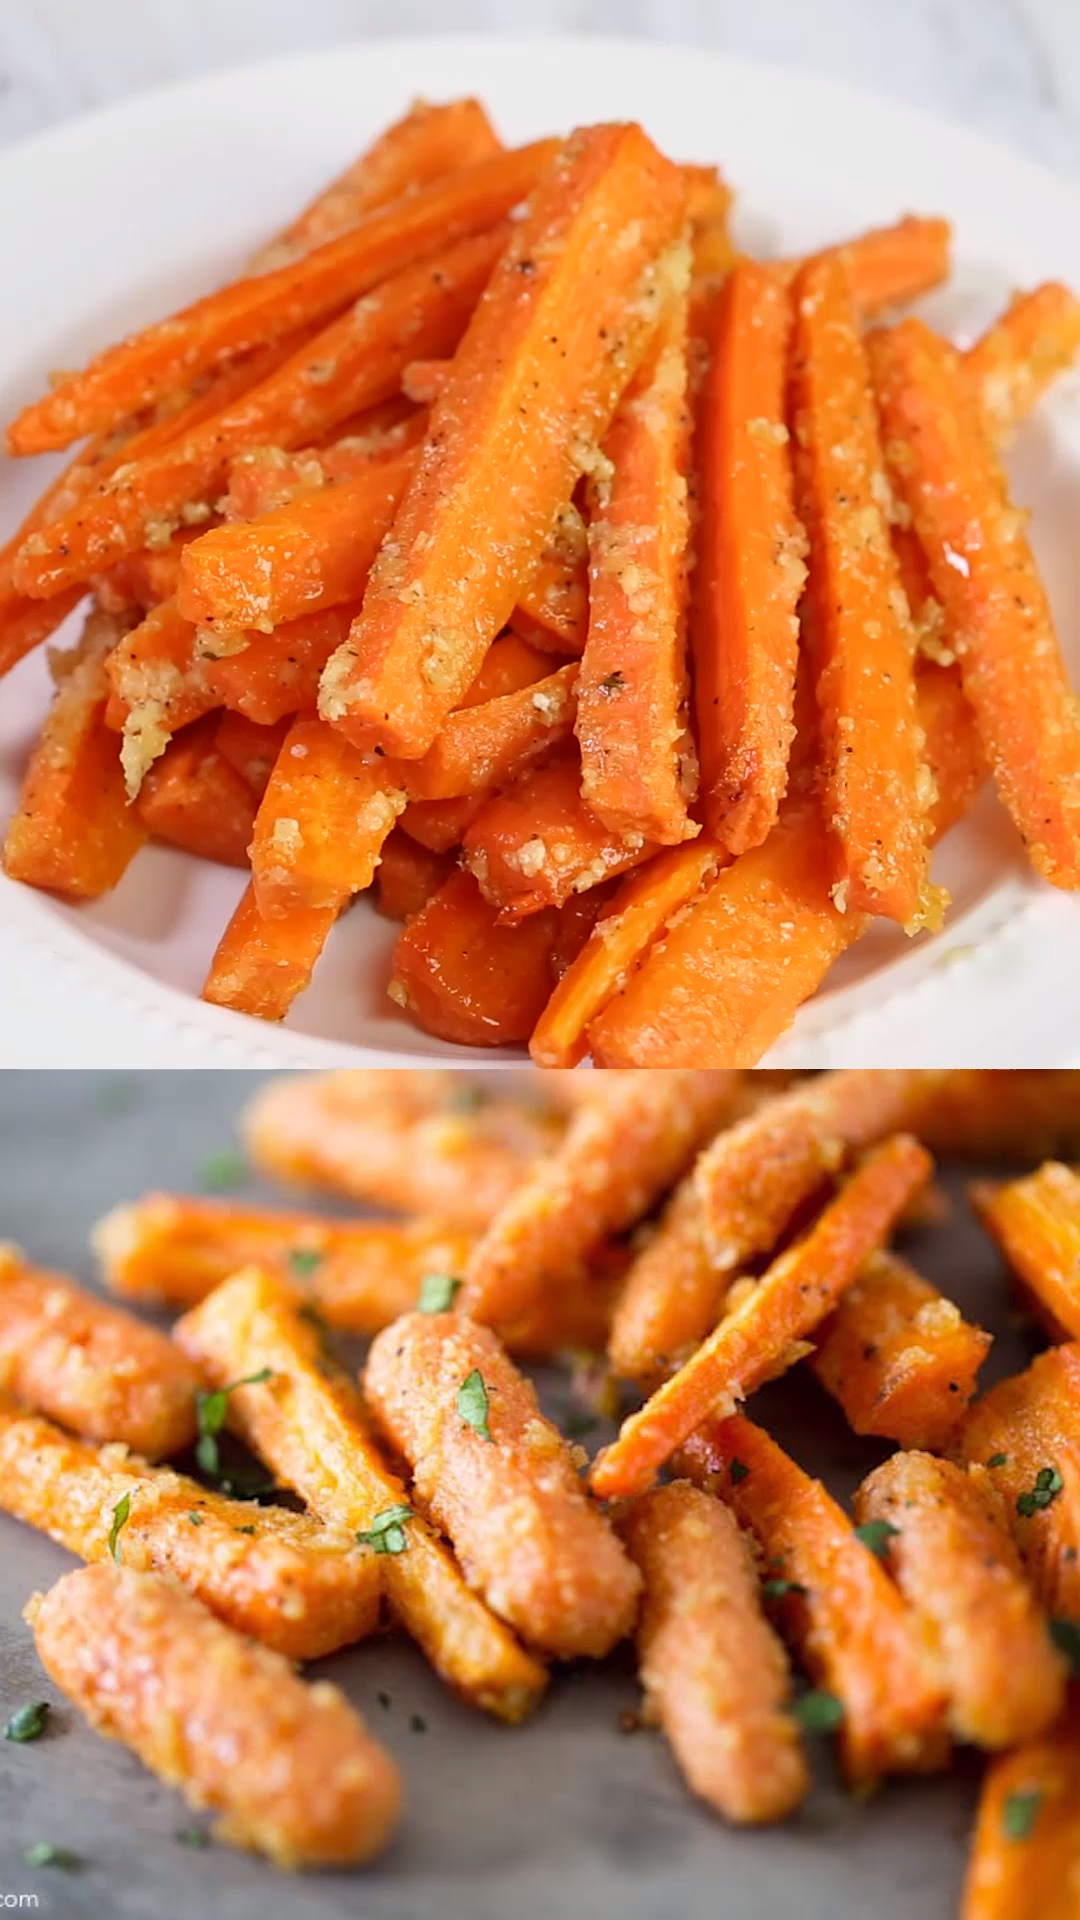 Photo of Parmesan Garlic Roasted Carrots